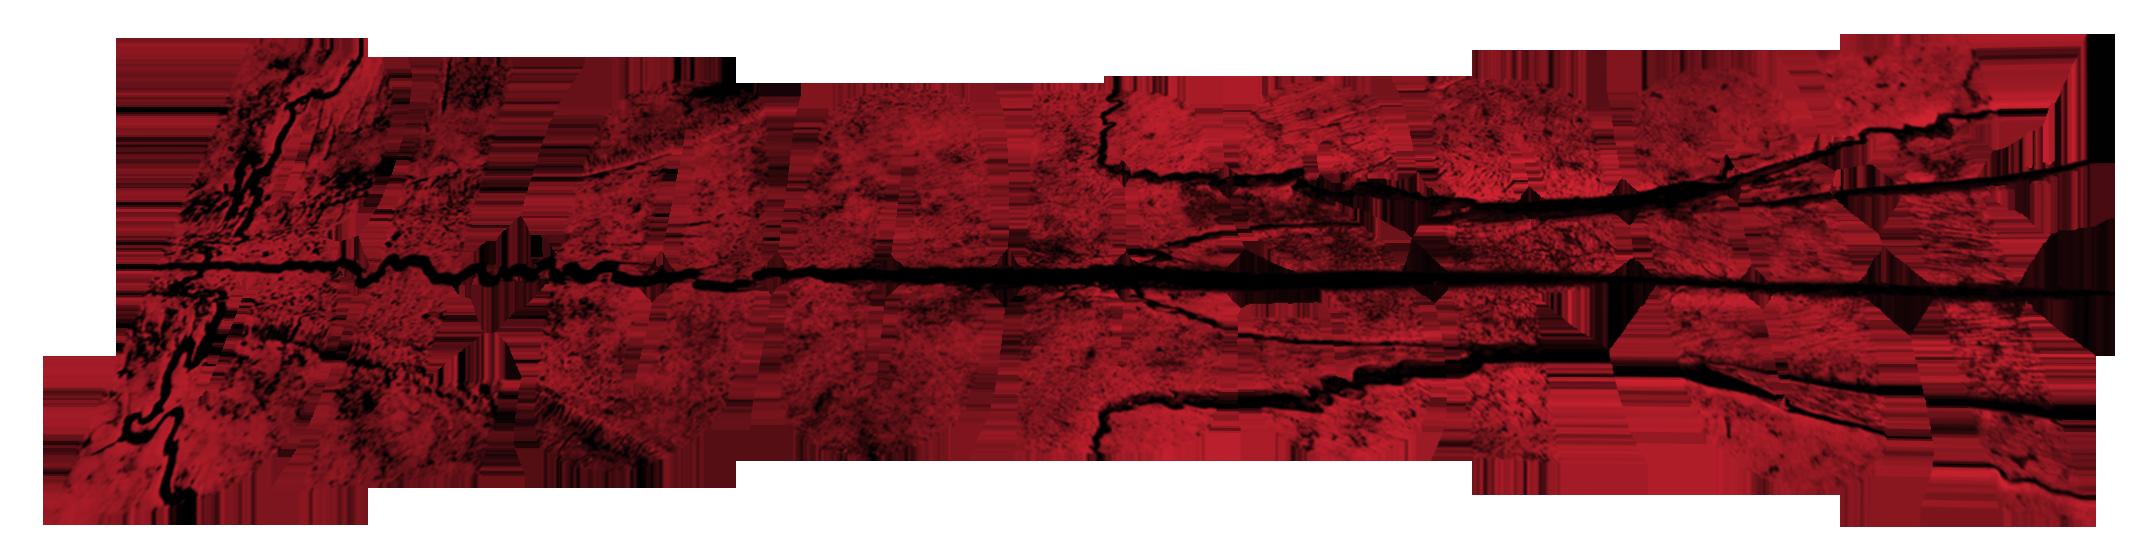 BLOODSPOT_transparency